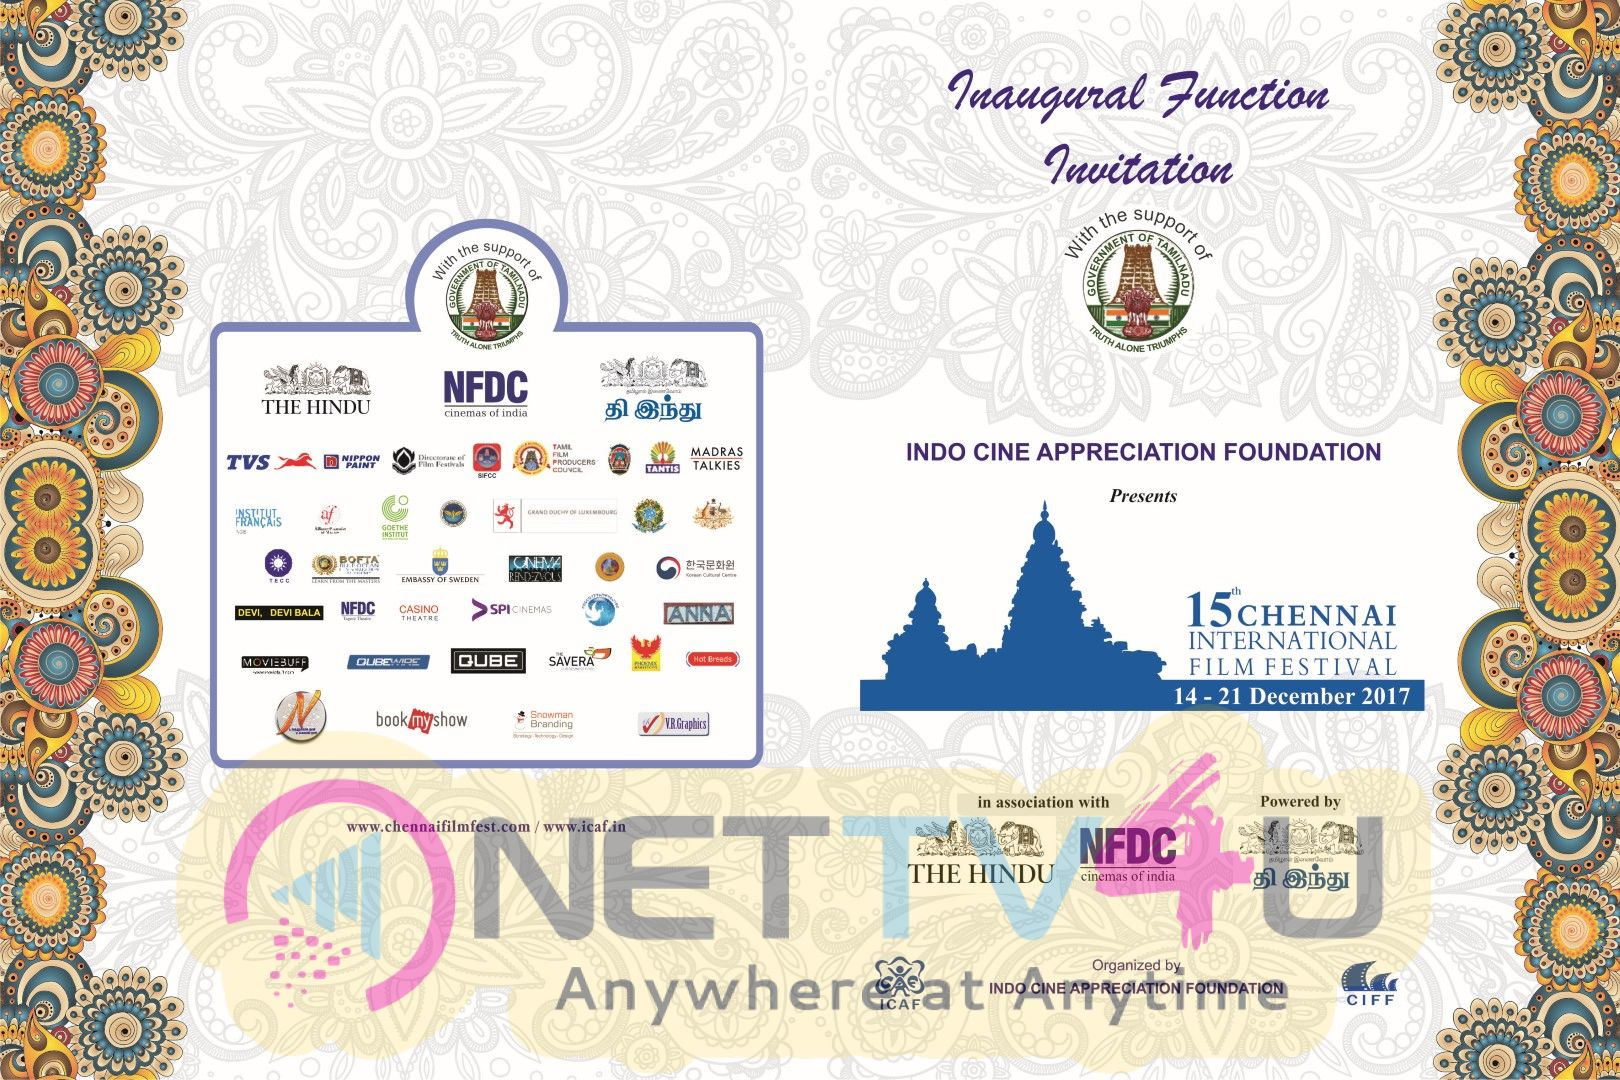 15th Chennai International Film Festival Inaugural Function Invitation